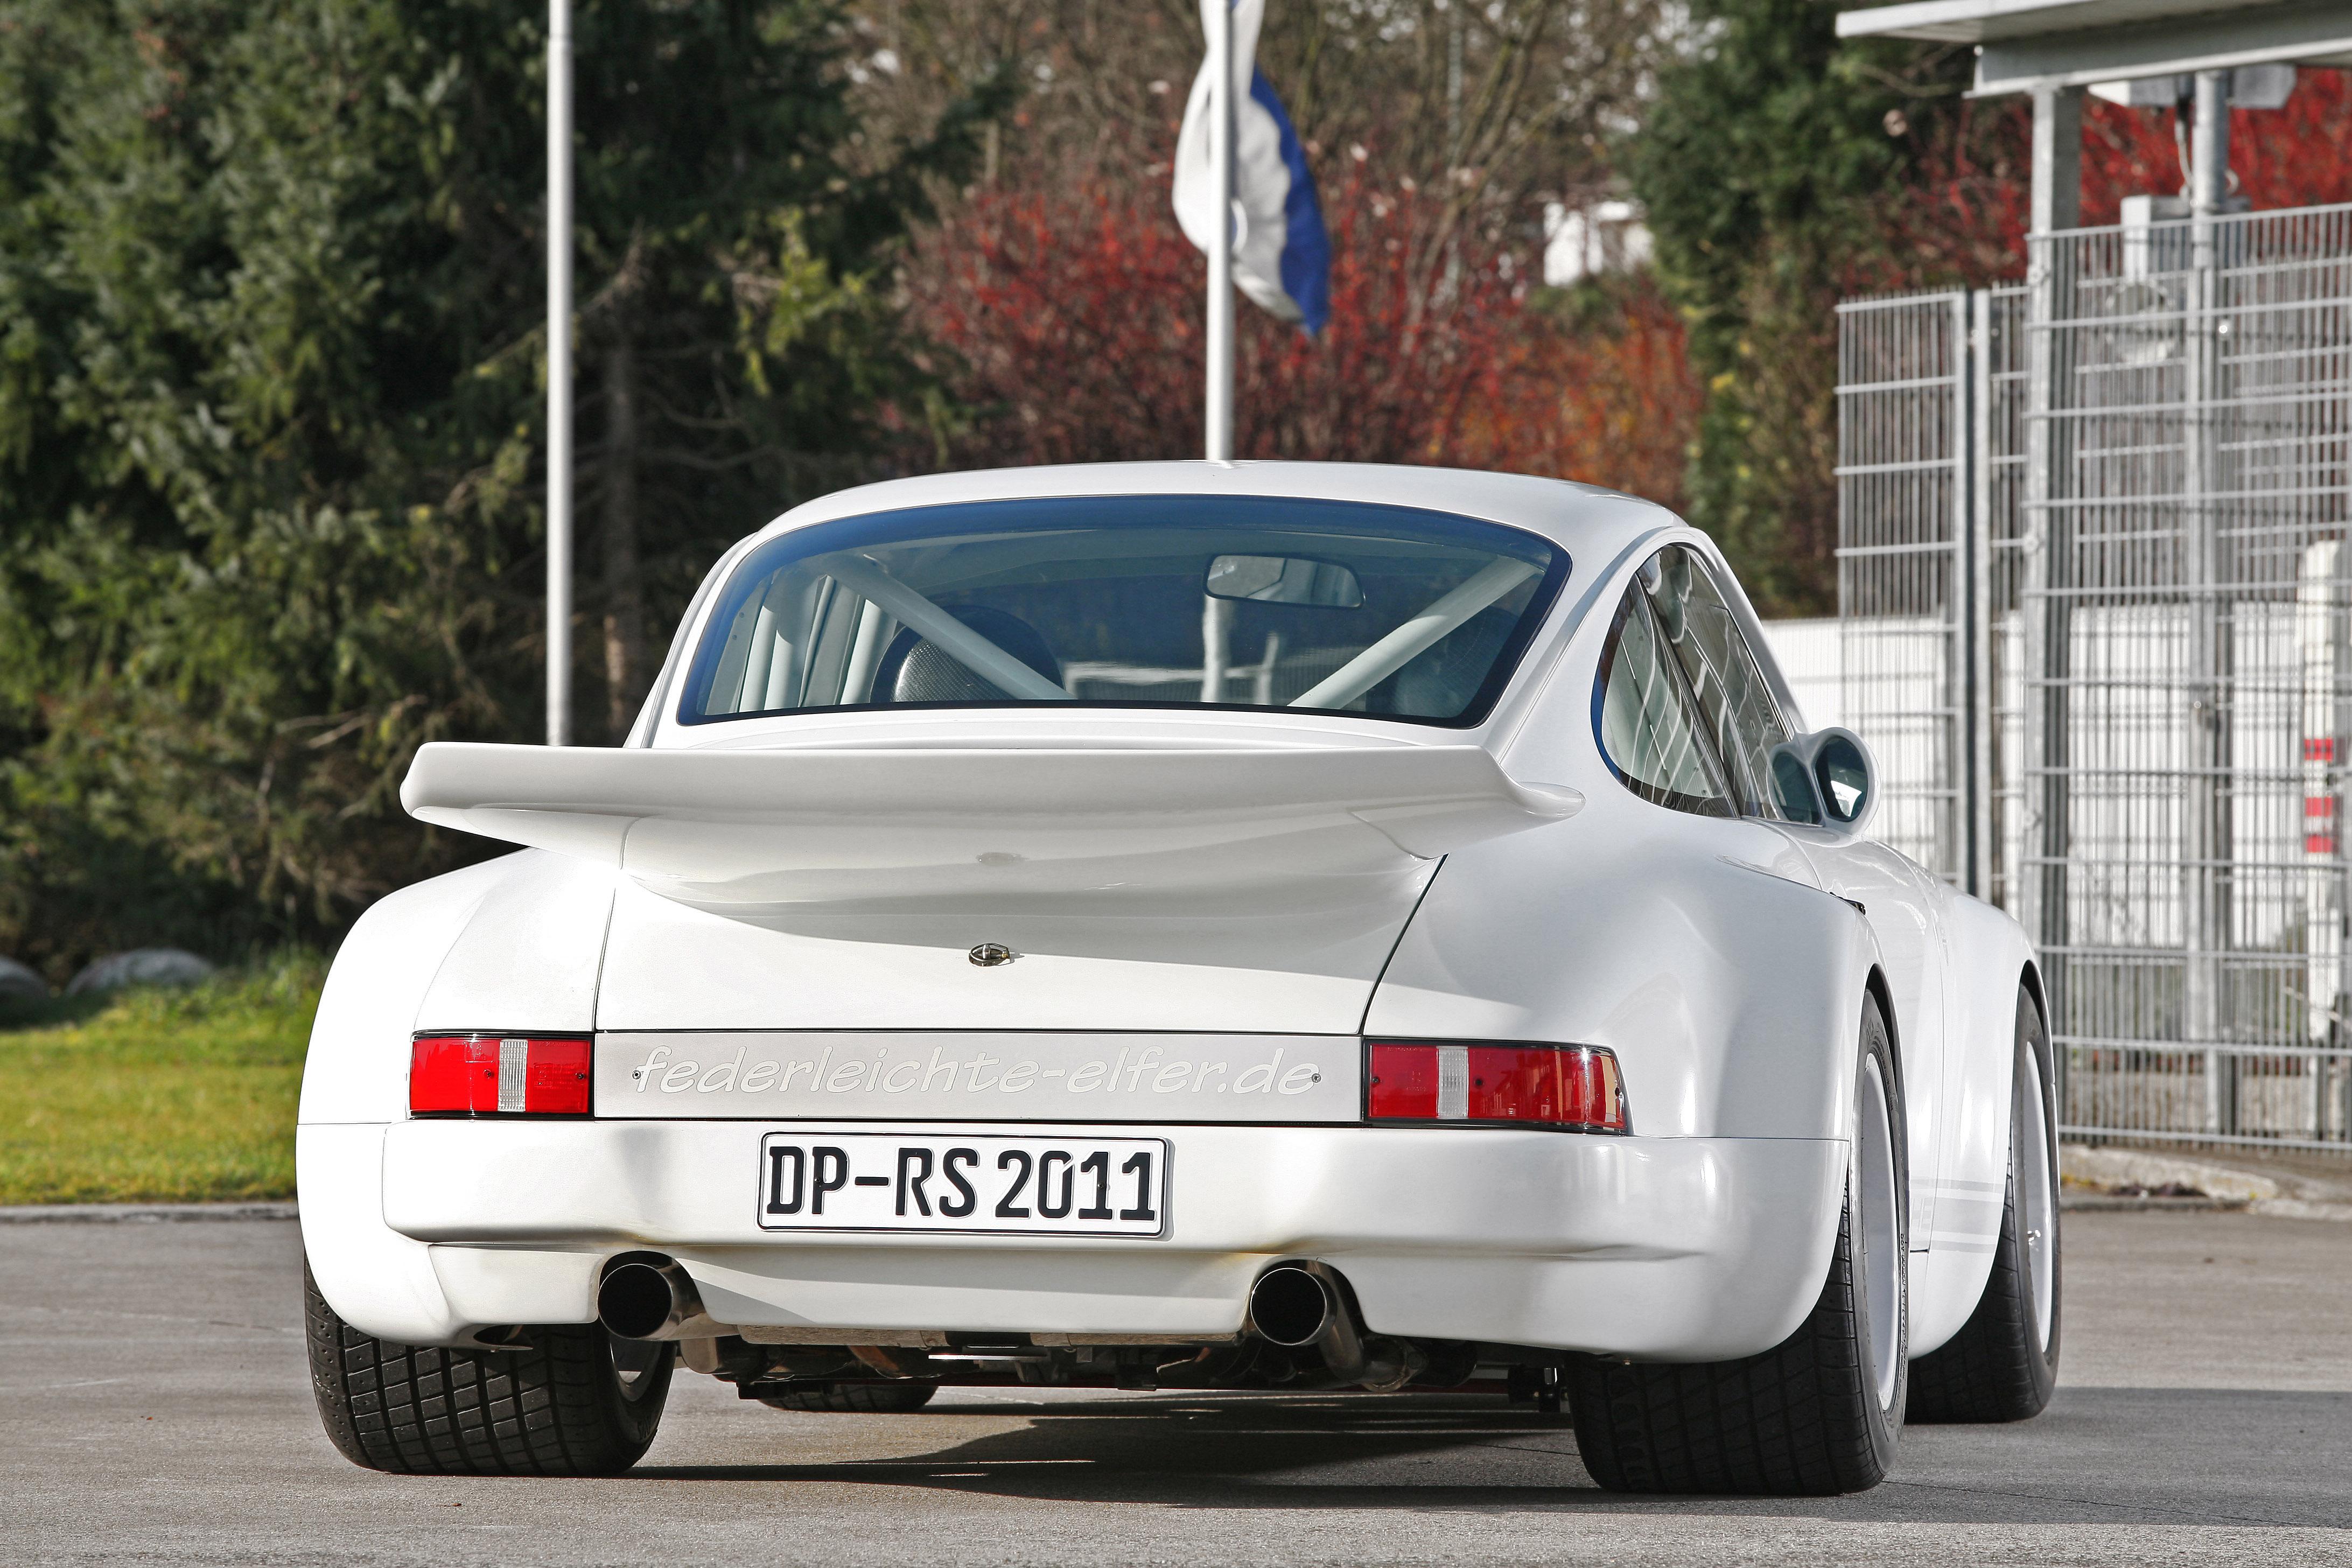 http://www.automobilesreview.com/img/dp-motorsport-1973-porsche-911/dp-motorsport-1973-porsche-911-15.jpg